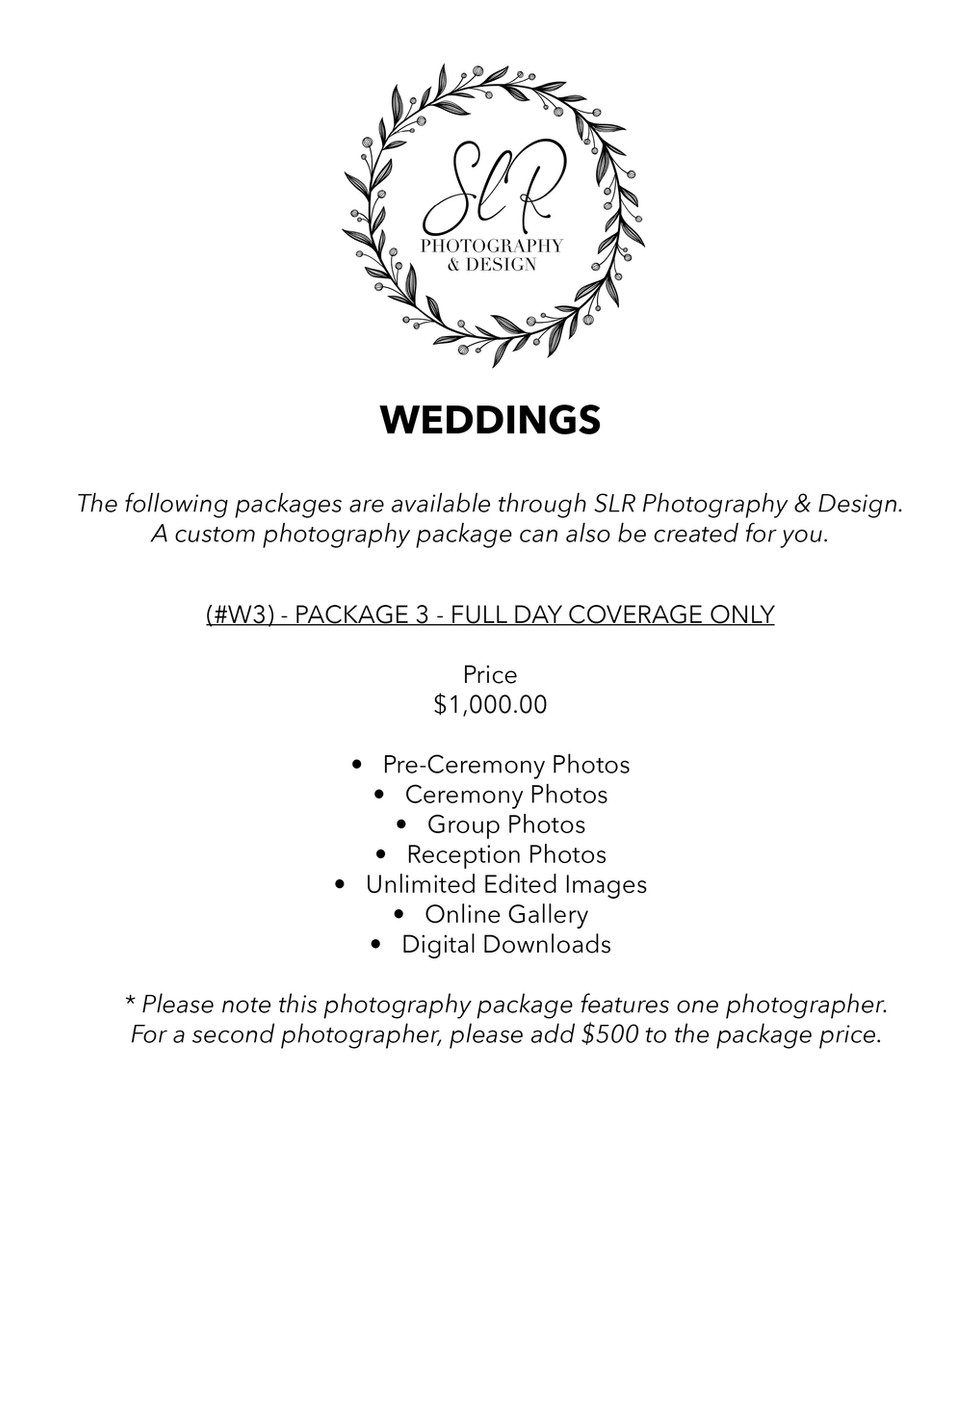 SLR Photography & Design price sheet -9.